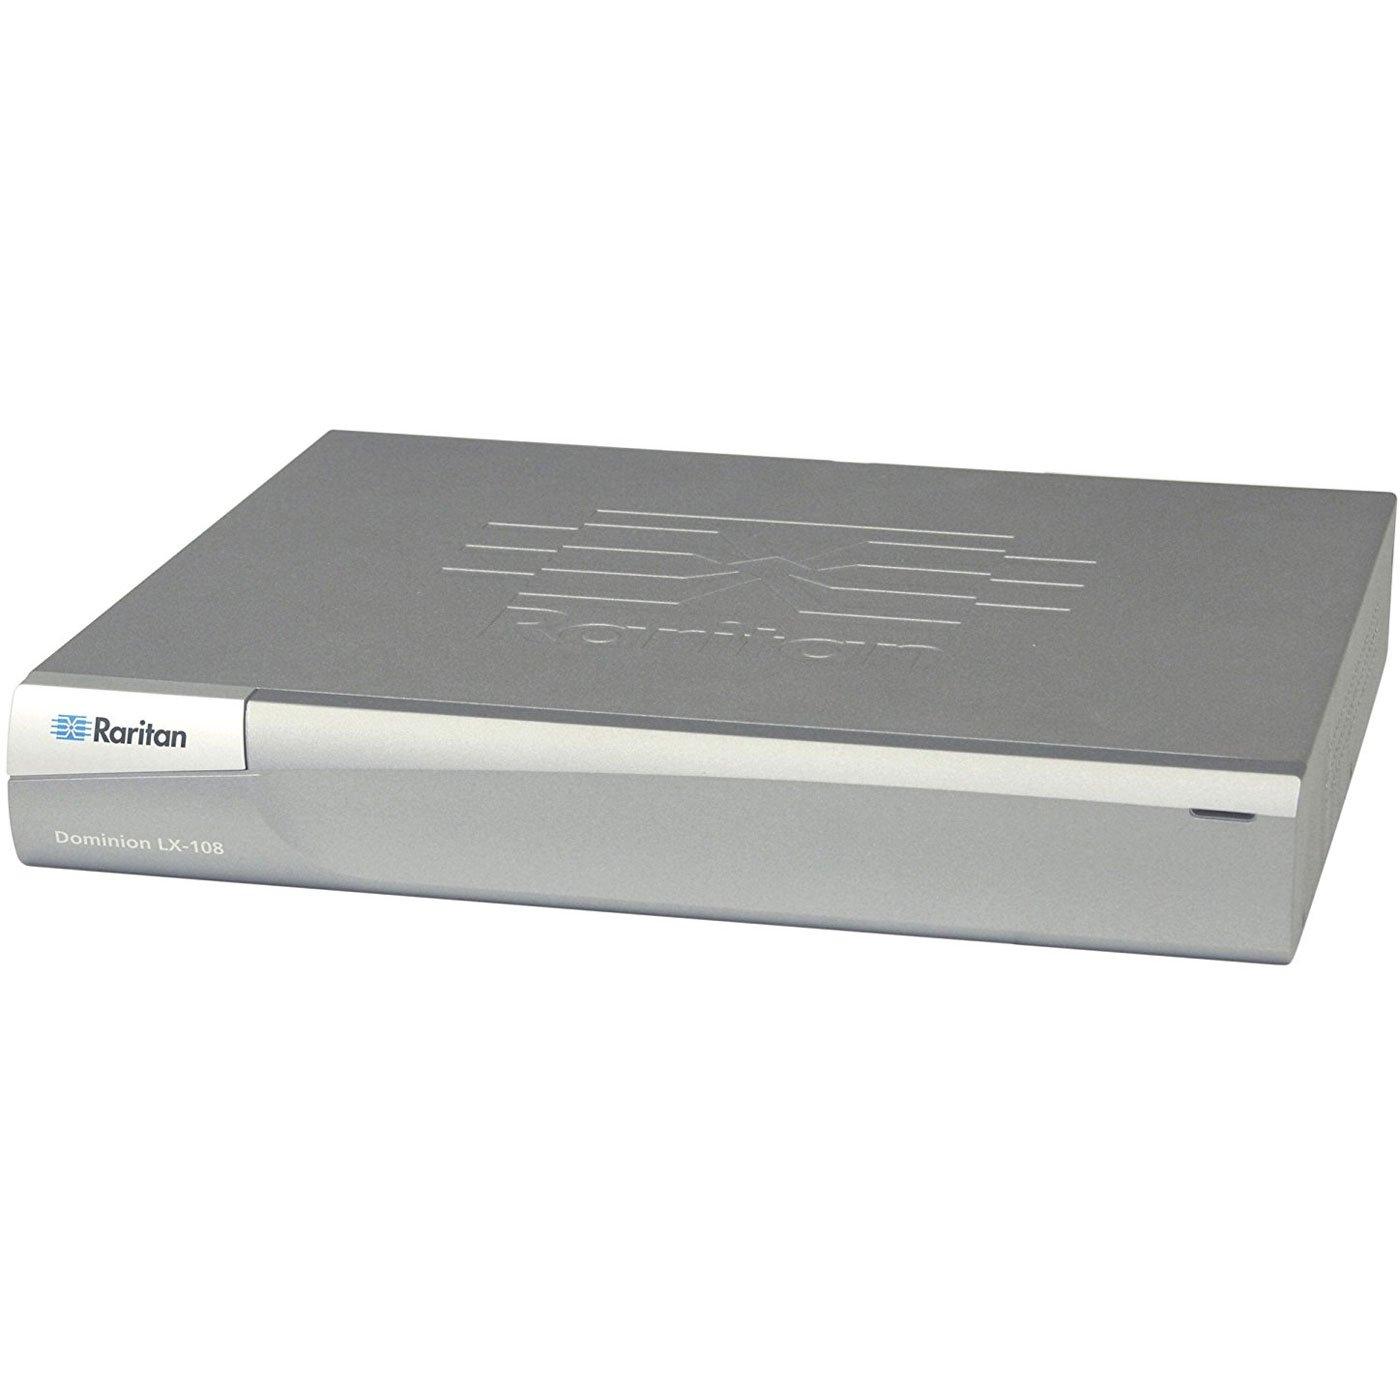 Raritan Dominion LX-108 - KVM switch - 8 ports - Rack-mountable (DLX-108)